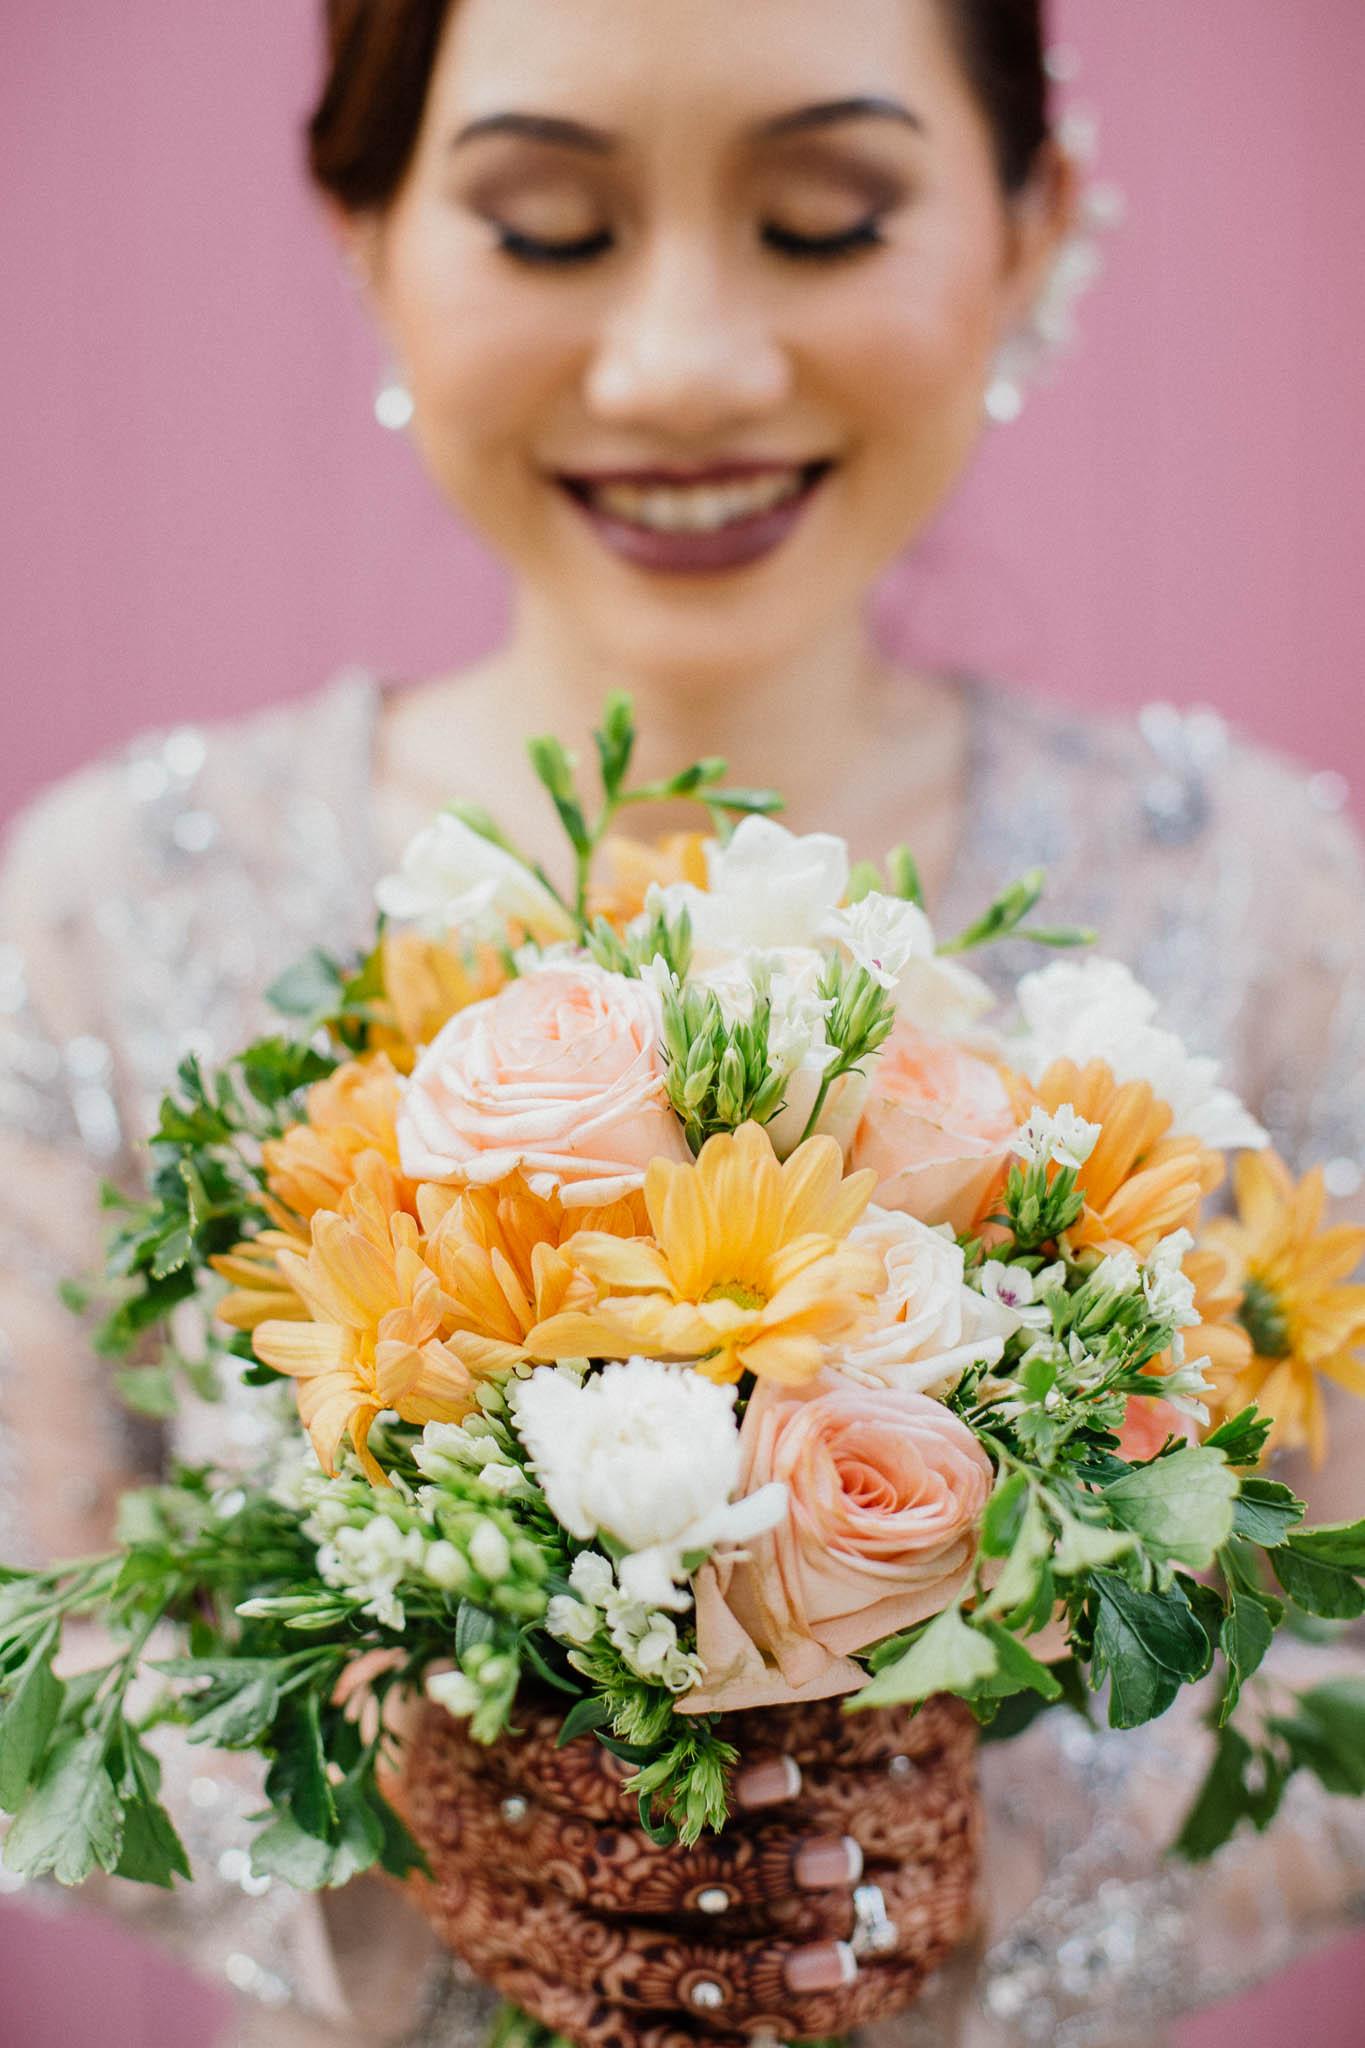 singapore-wedding-photographer-wedding-nufail-addafiq-081.jpg